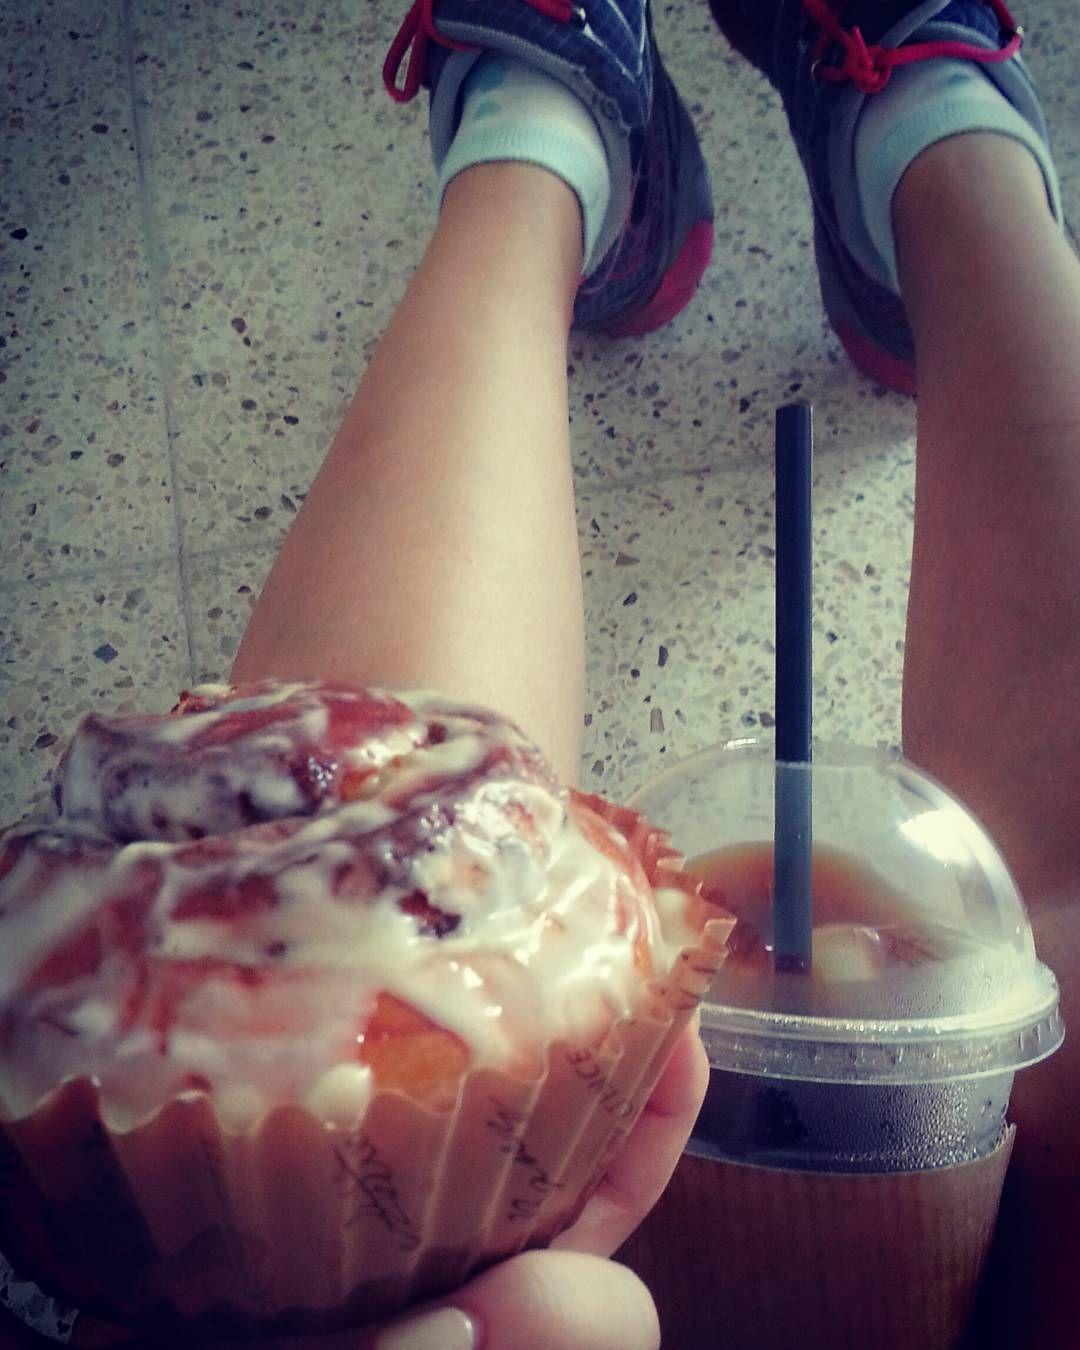 Reason why i did gymmin today #빵순이 #먹기위해산다 #먹방스타그램 #테잌아웃 #시나몬롤빵 #cinnamonroll #takeawaycoffee #icelongblack #foodstagram #breadholic by kj_kijuehong